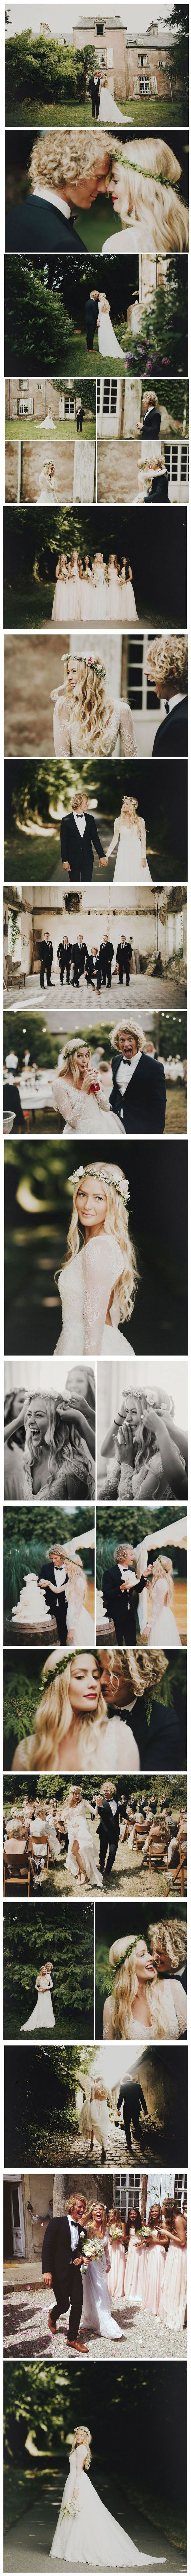 Laid Back French Château Wedding: Hildegunn + Samuel This is so beautiful.